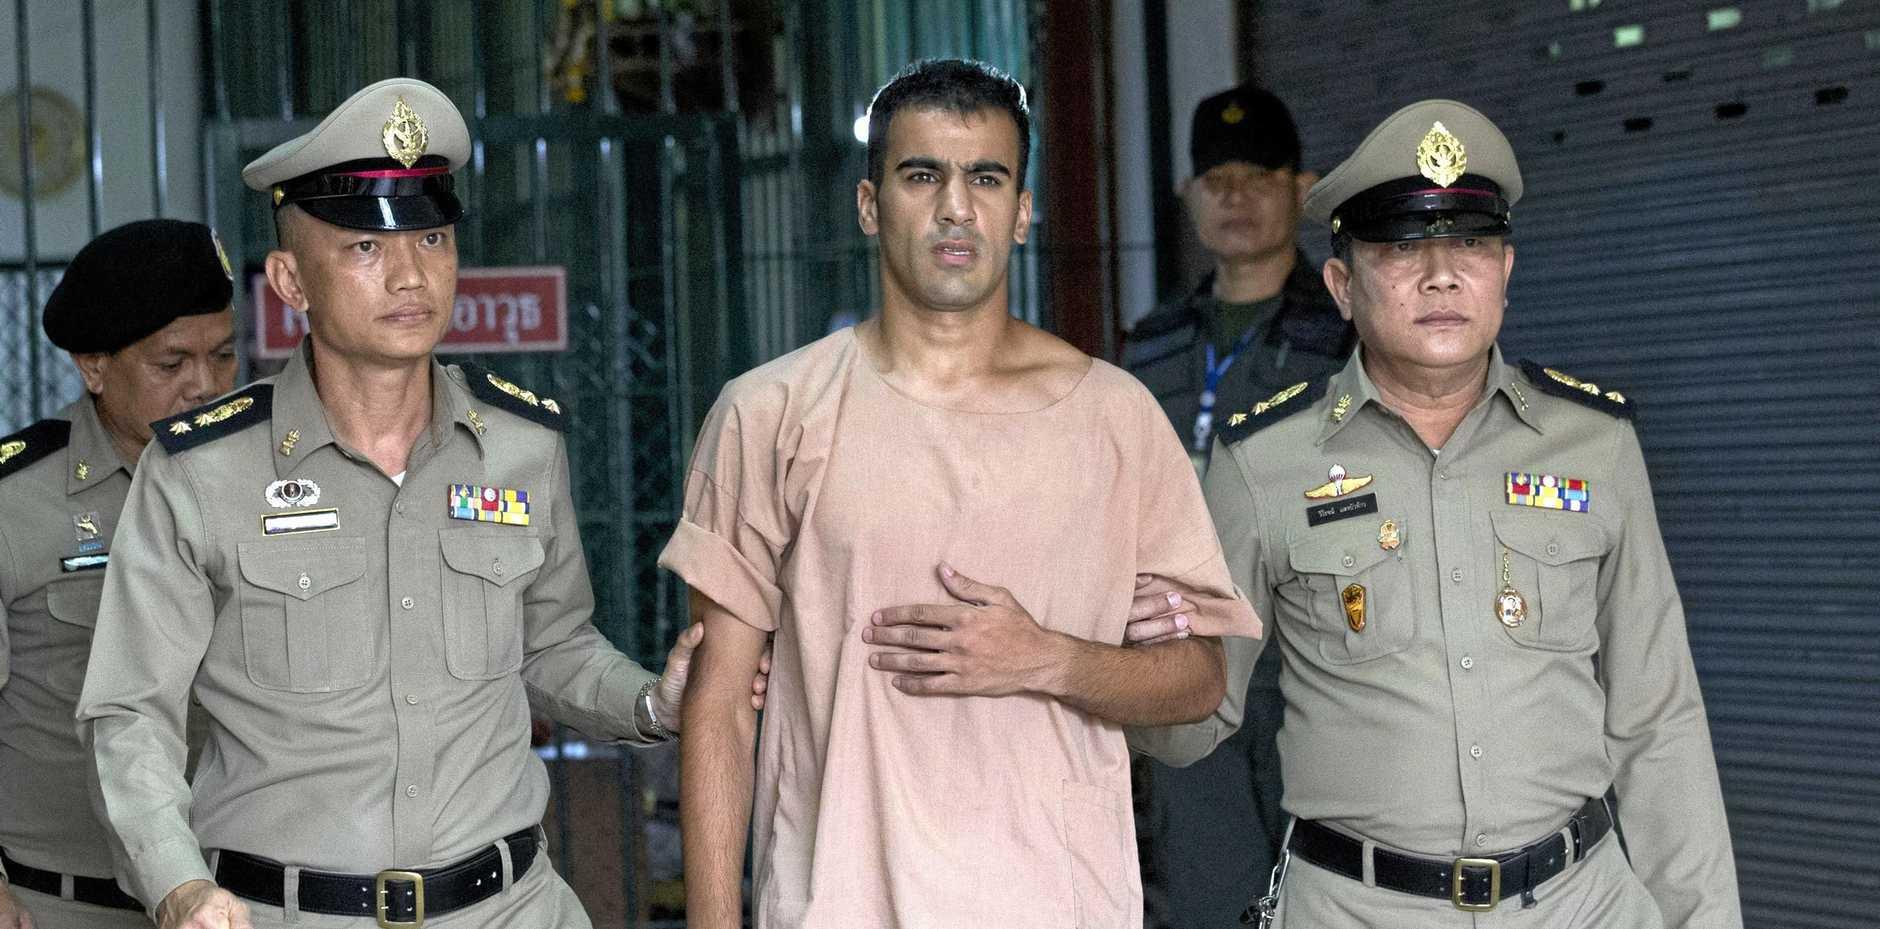 Australian refugee Hakeem al-Araibi (centre) leaves the criminal court in Bangkok, Thailand.